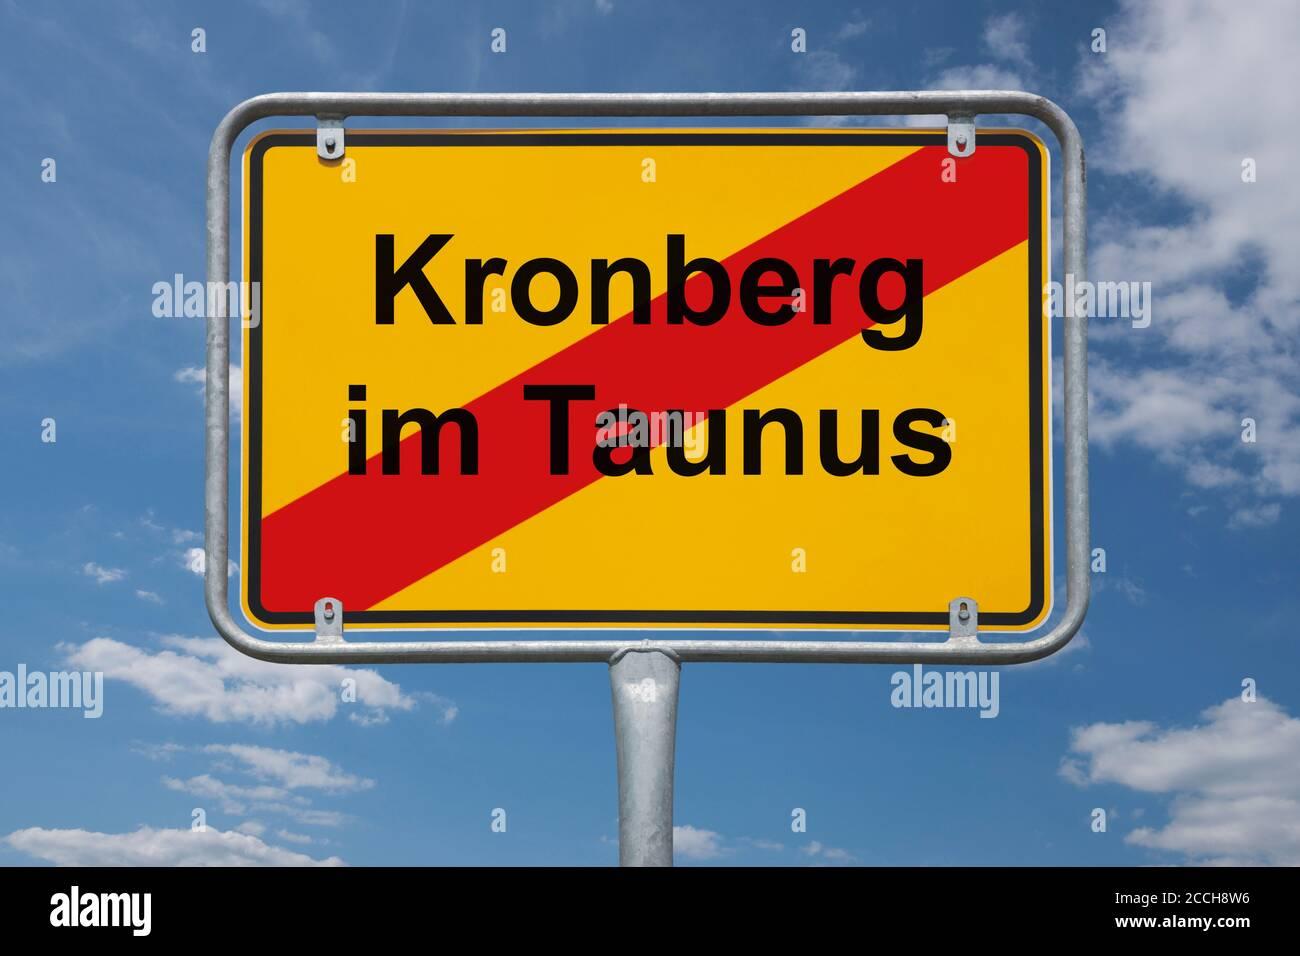 Ortstafel Kronberg im Taunus, Hessen, Deutschland | Place name sign Kronberg im Taunus, Hesse, Germany, Europe Stock Photo